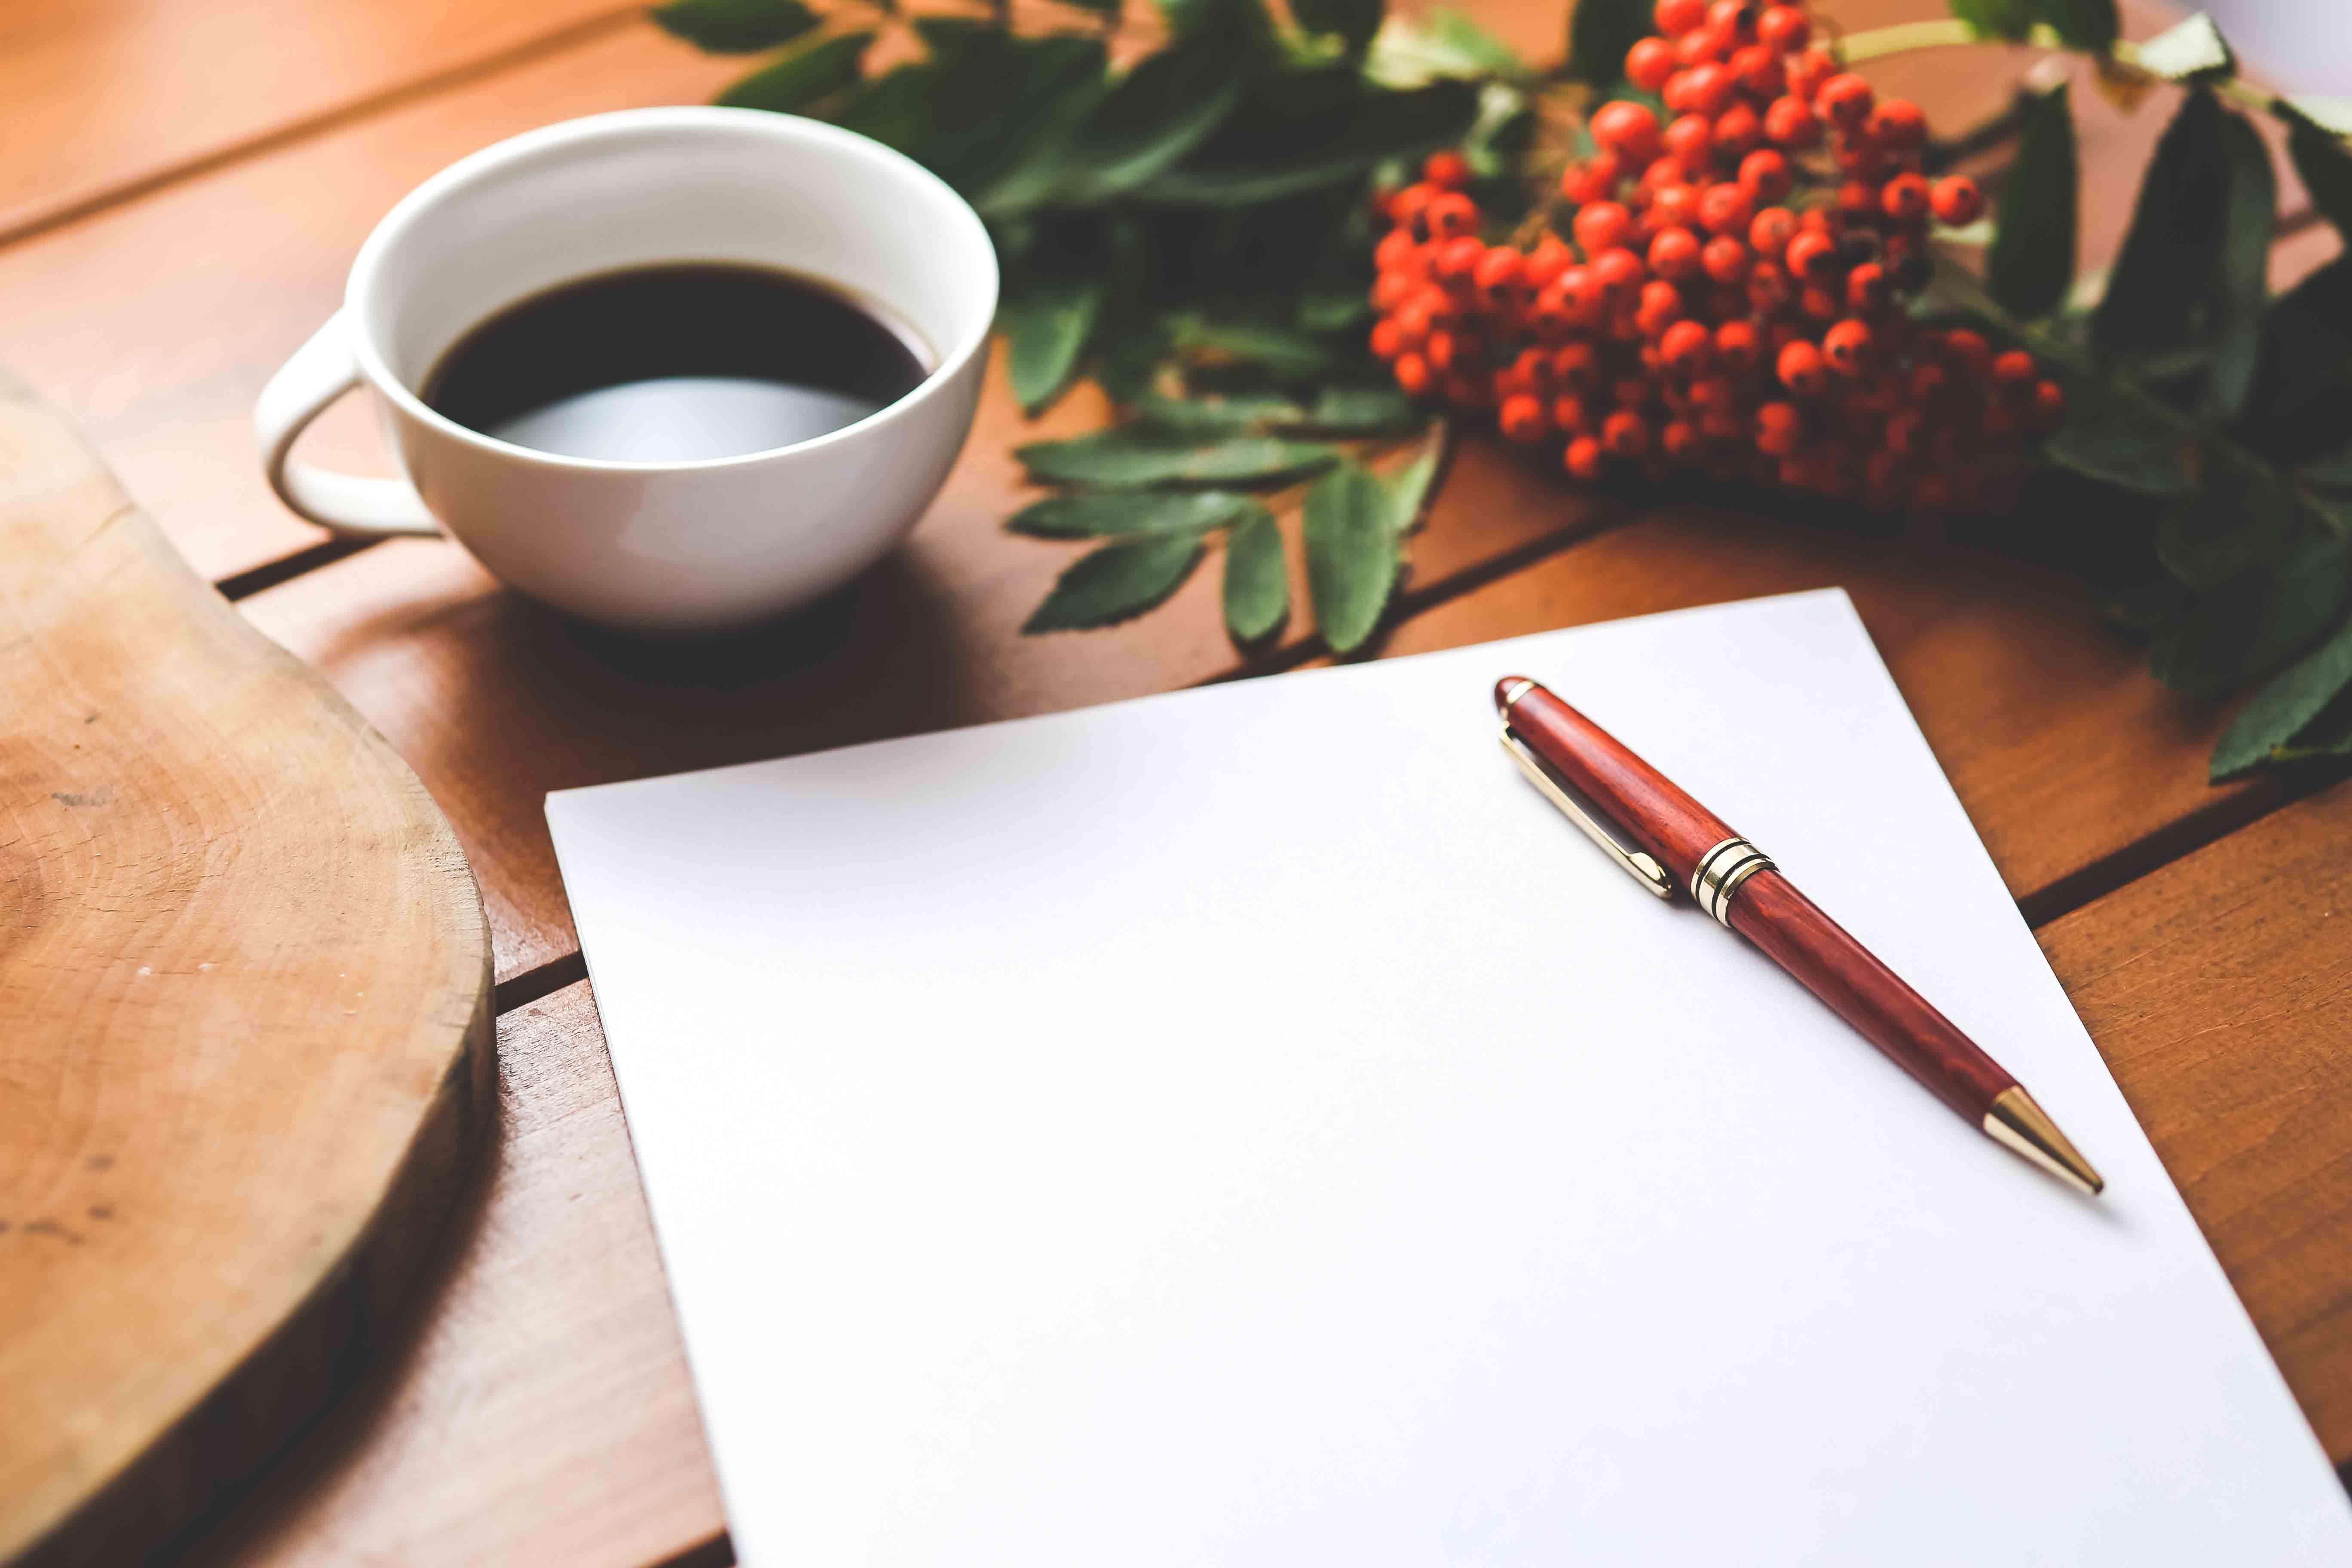 Writing, pen, paper, grapes